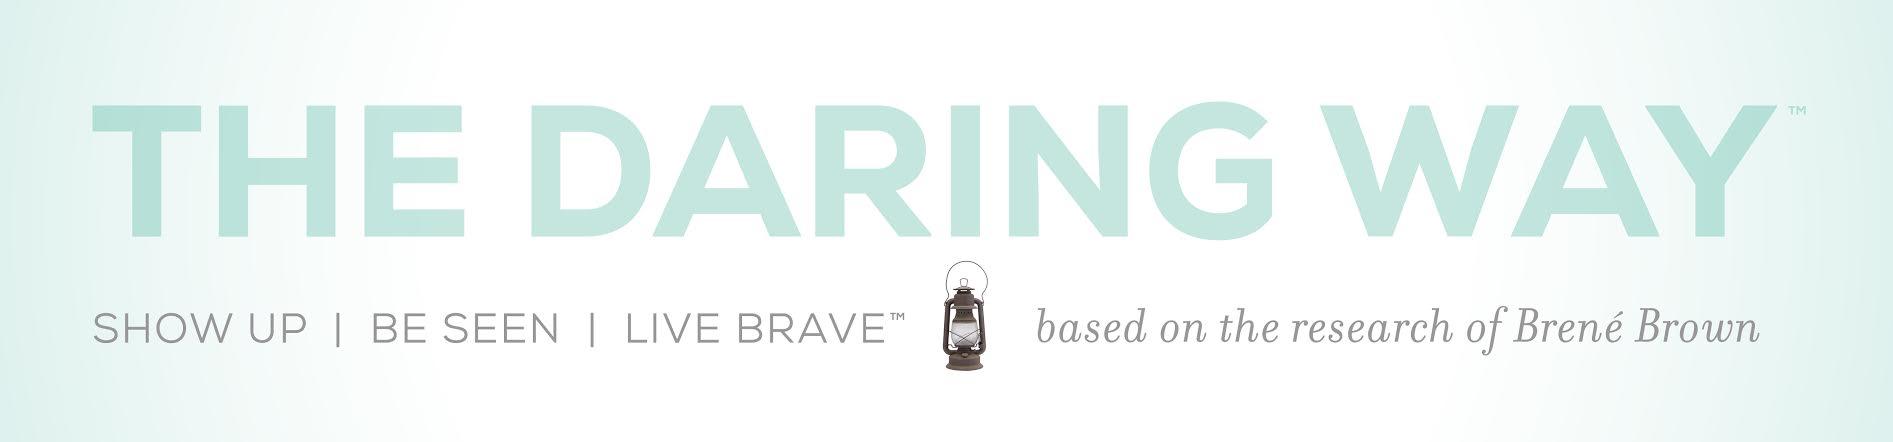 the daring way banner